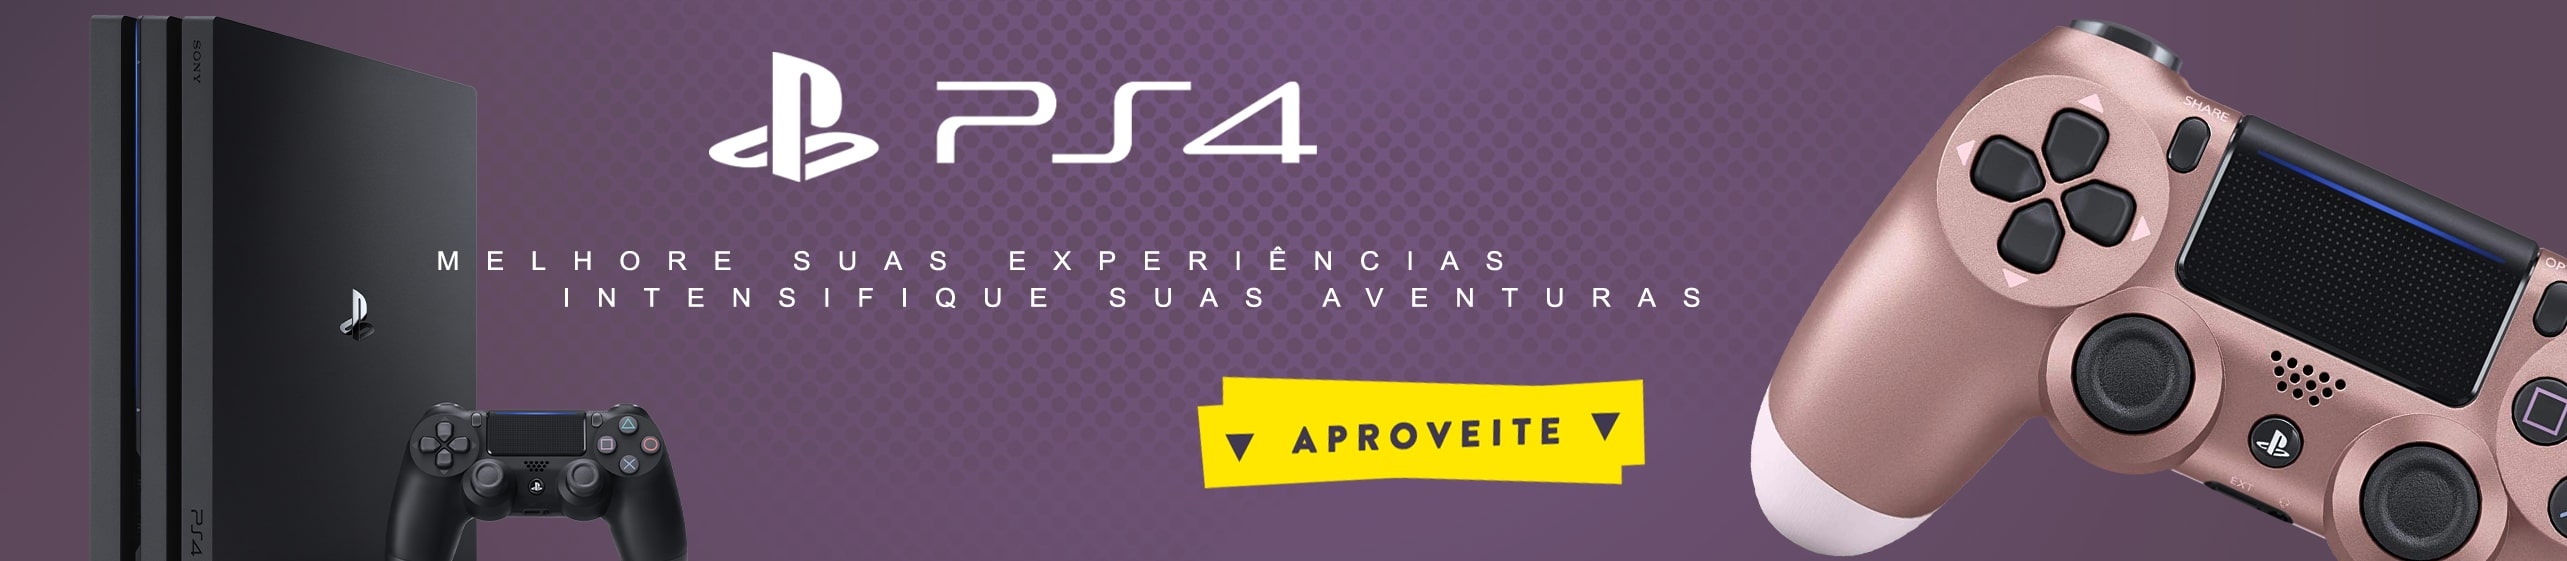 Games - Playstation